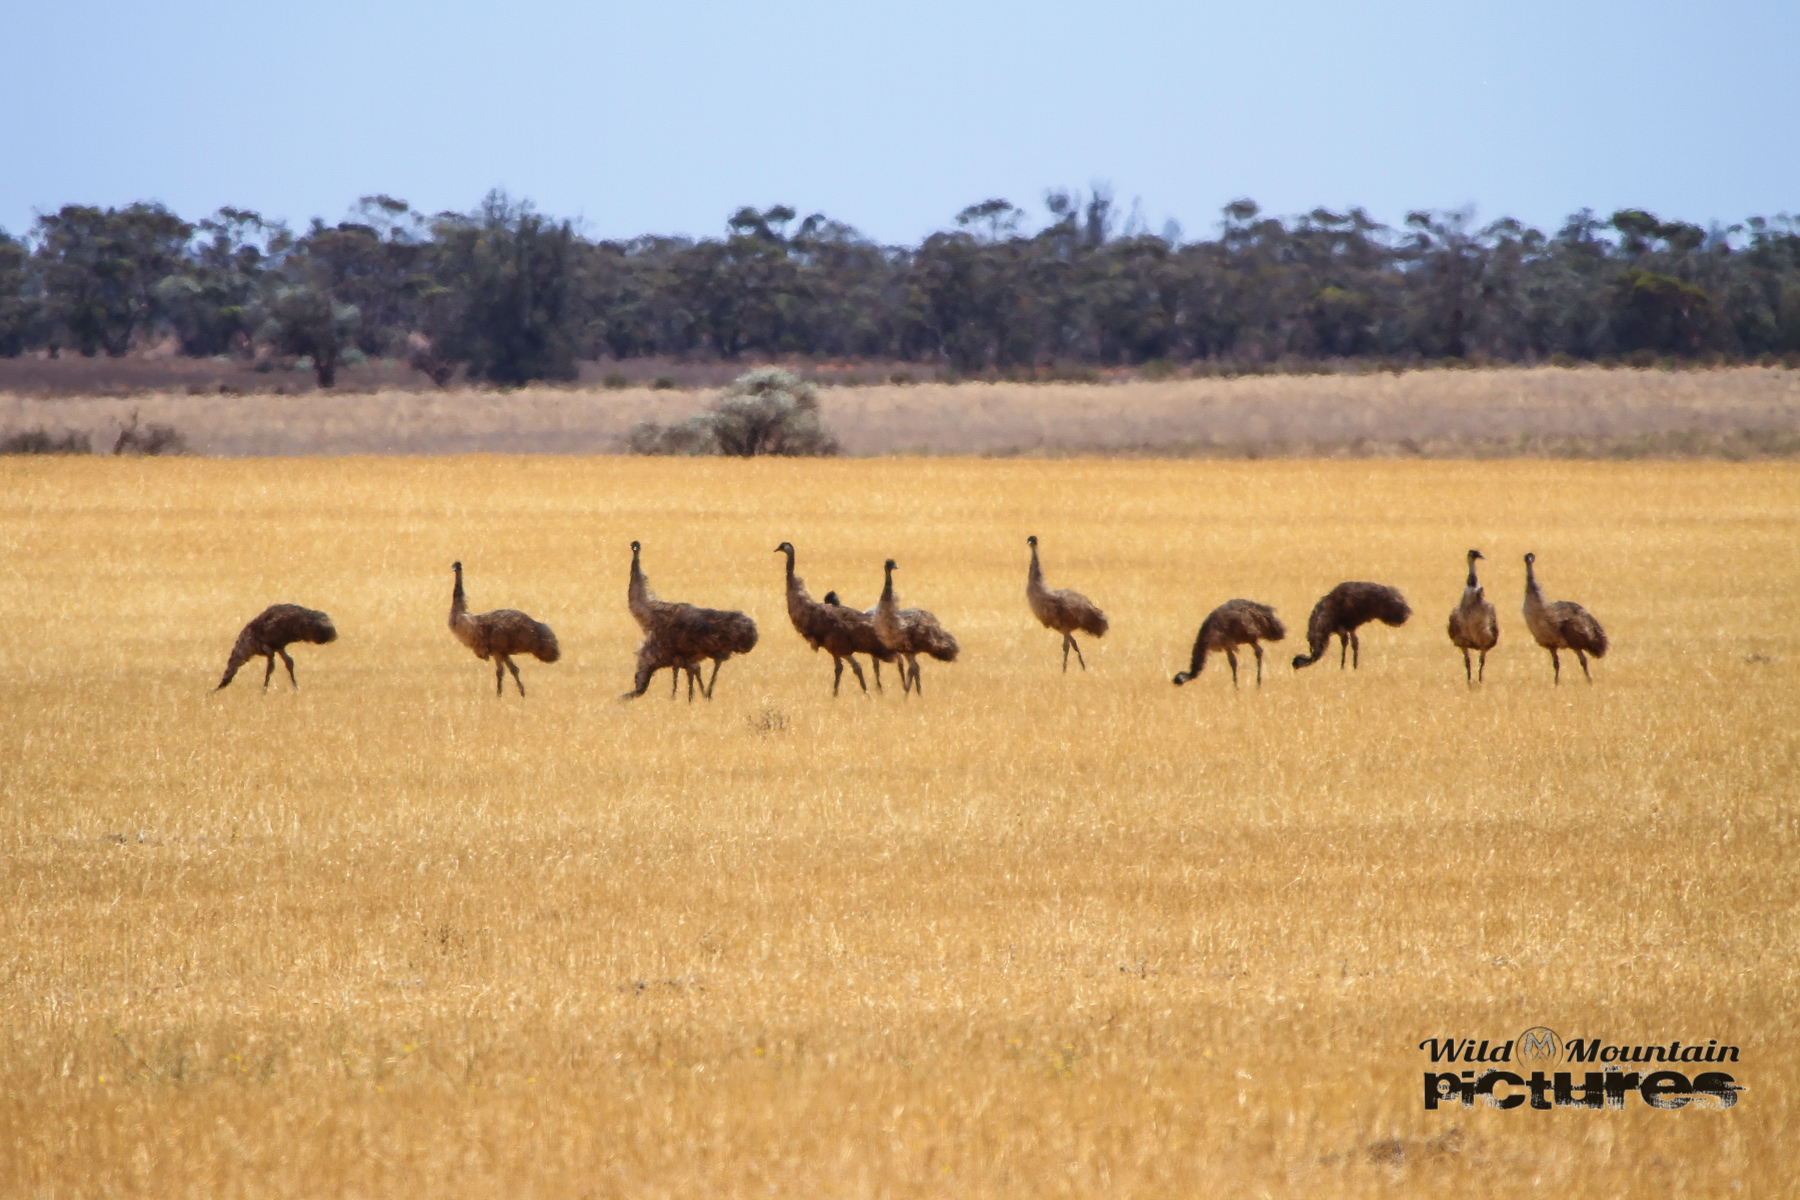 Some Emus